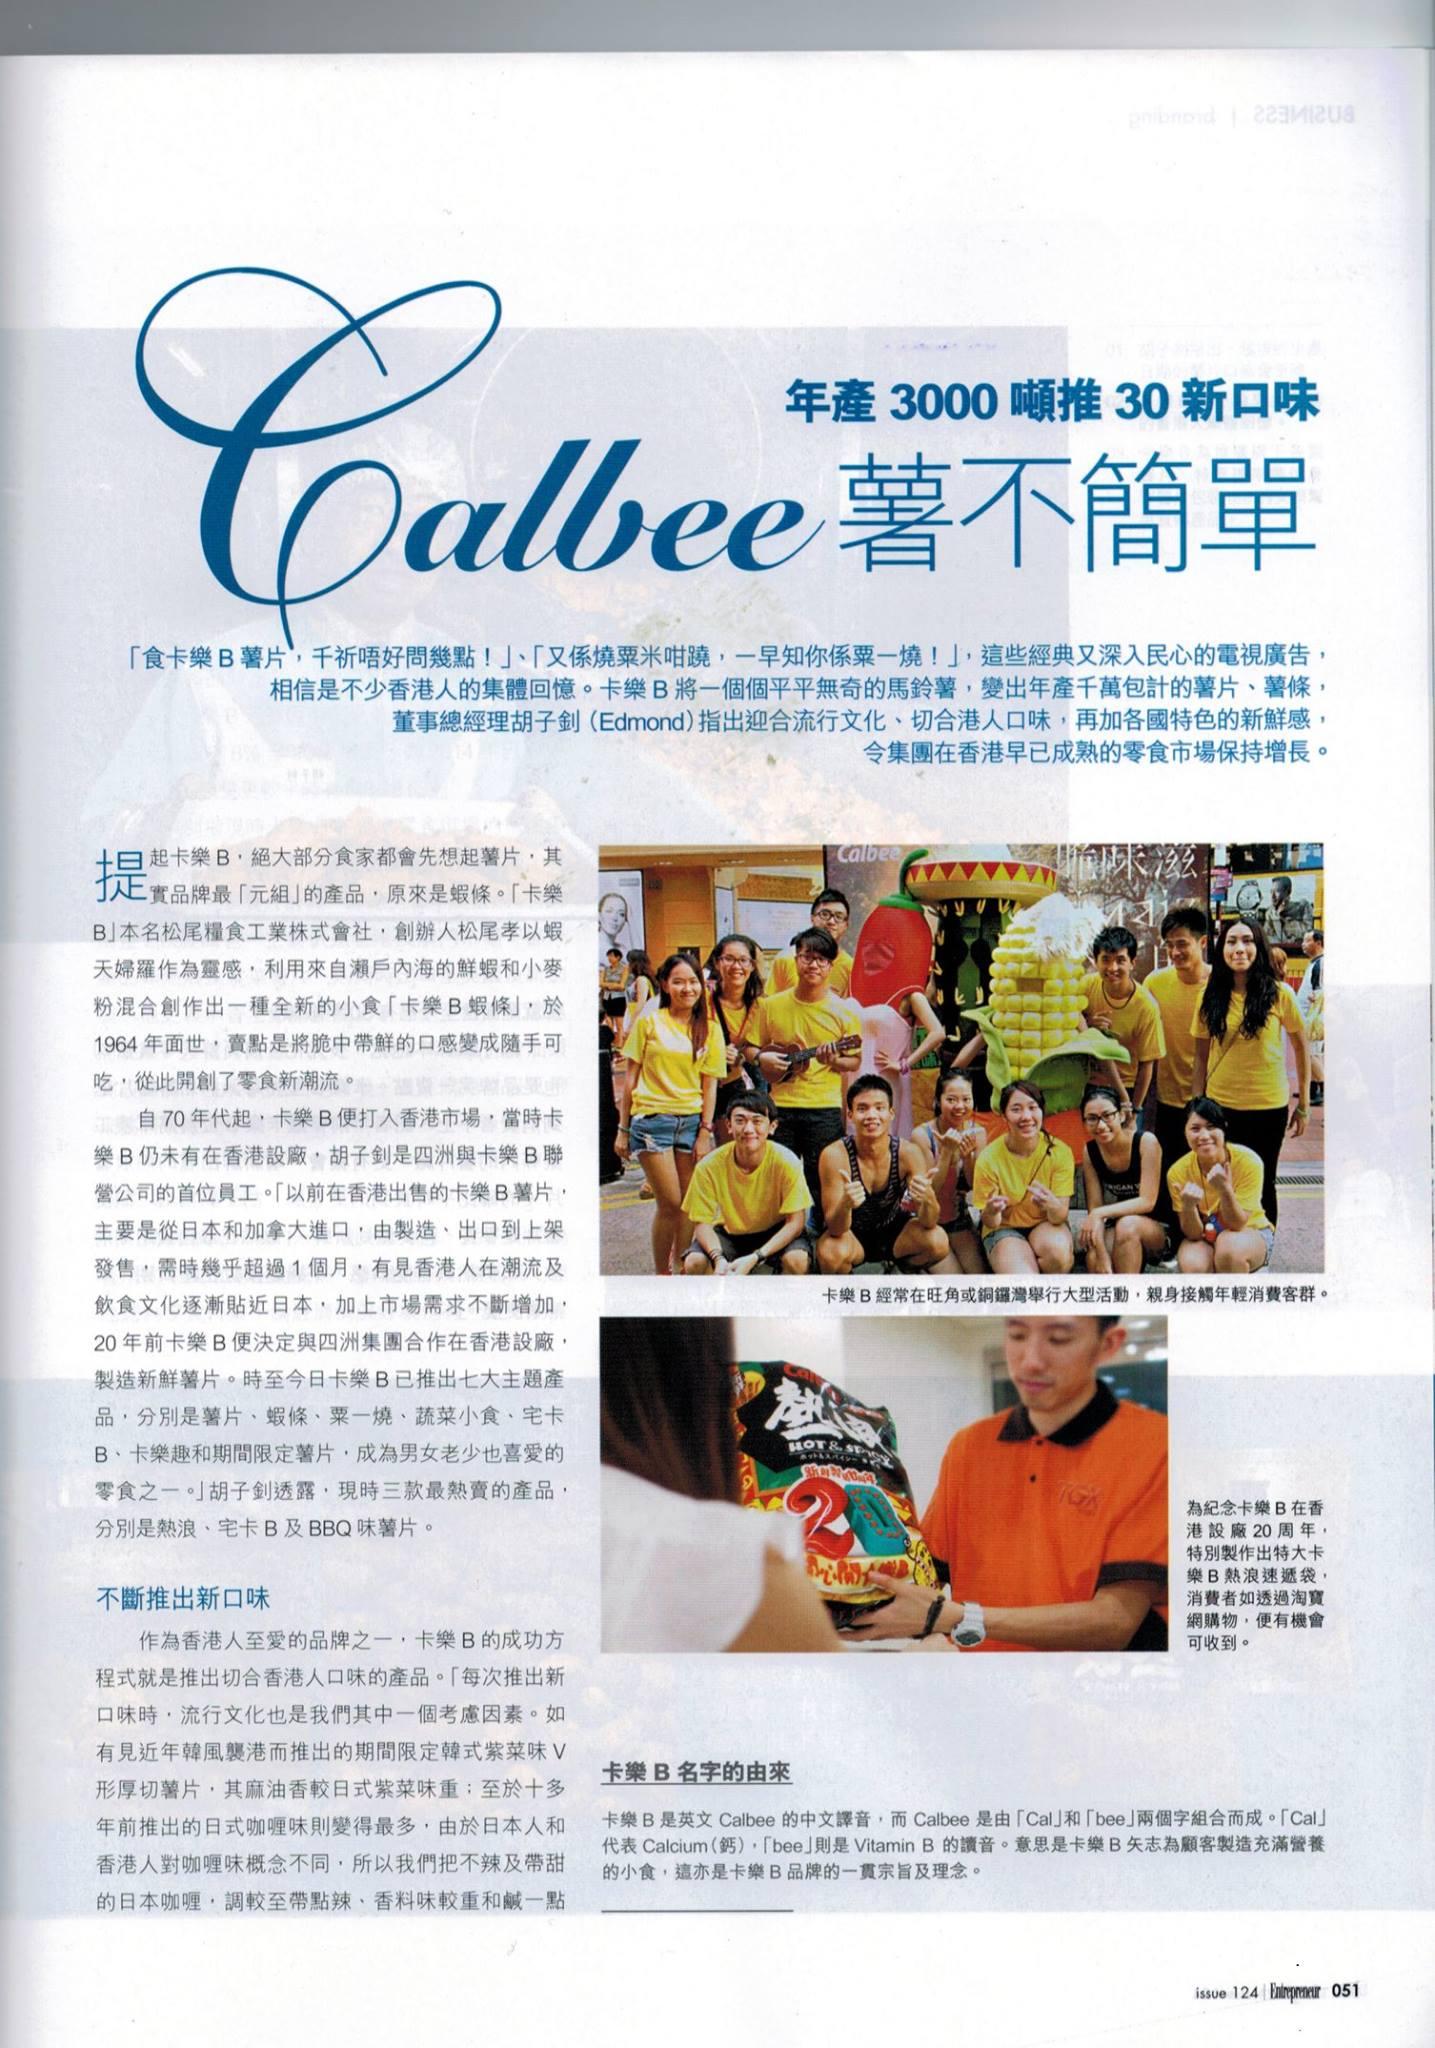 Calbee 16